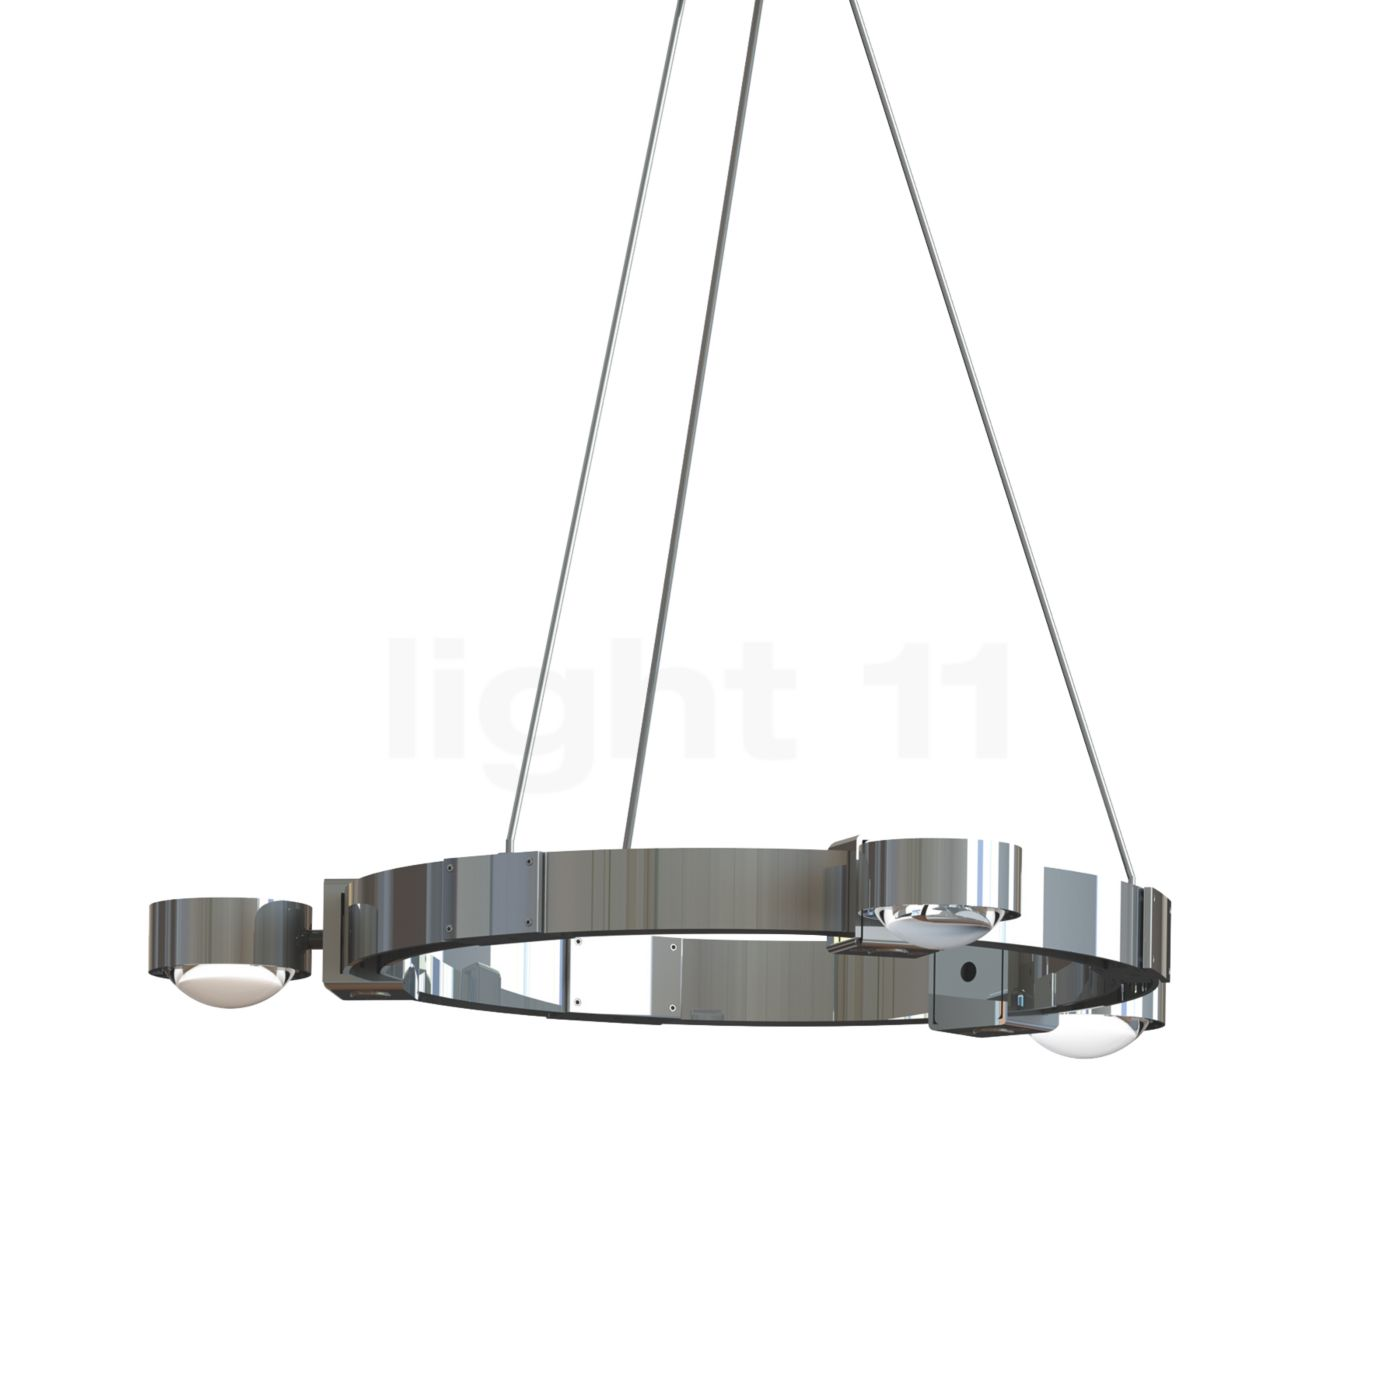 top light puk maxx crown s led arbeitsplatzleuchte. Black Bedroom Furniture Sets. Home Design Ideas